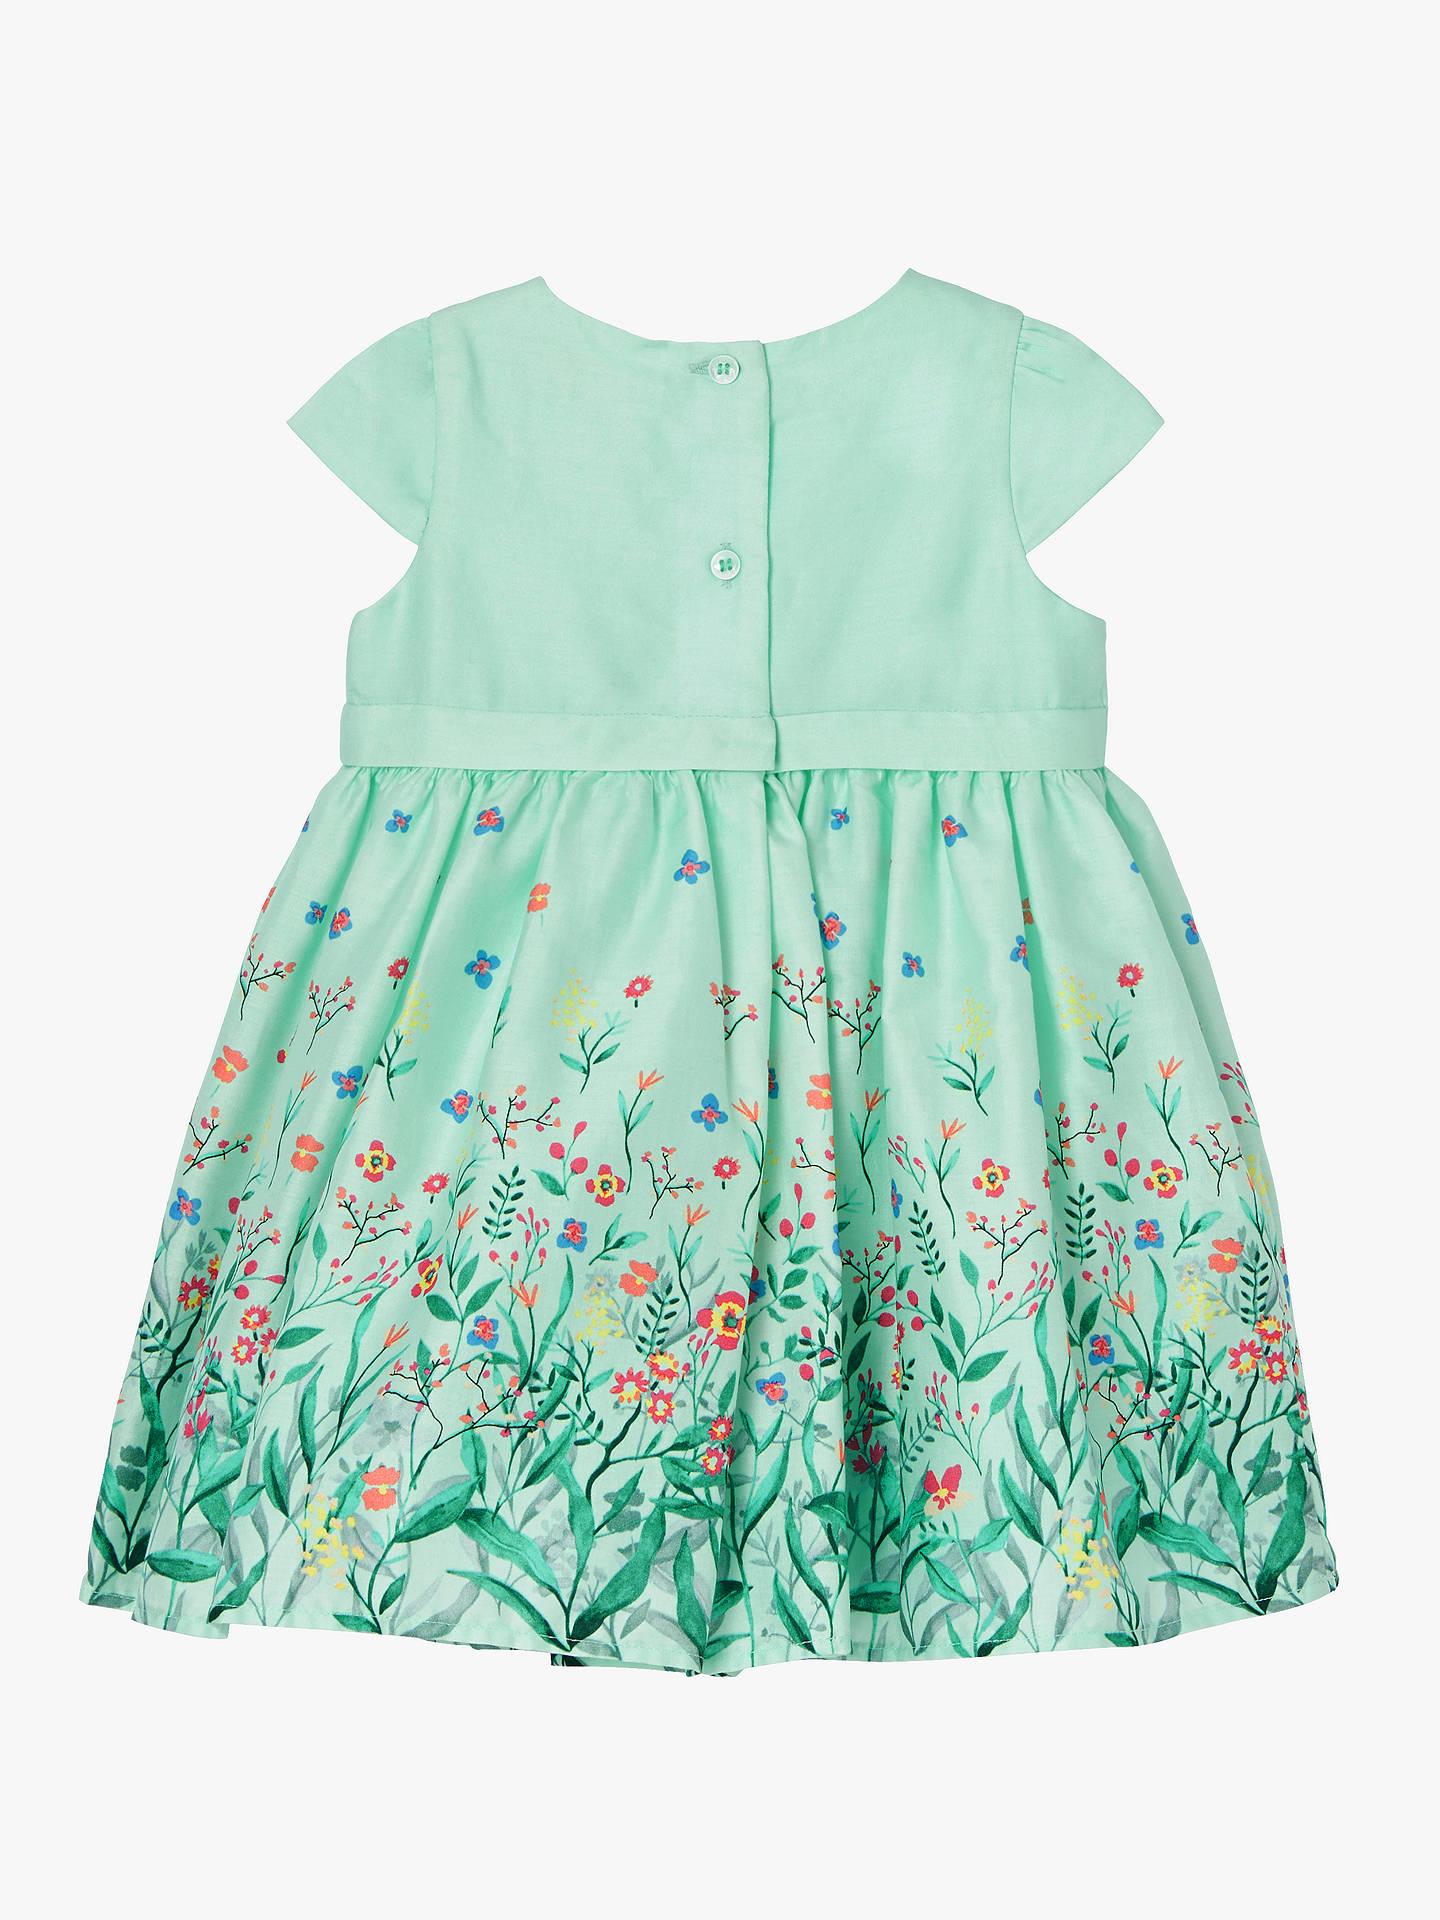 9d8711adb ... Buy John Lewis & Partners Baby Floral Border Dress, Mint, 0-3 months ...